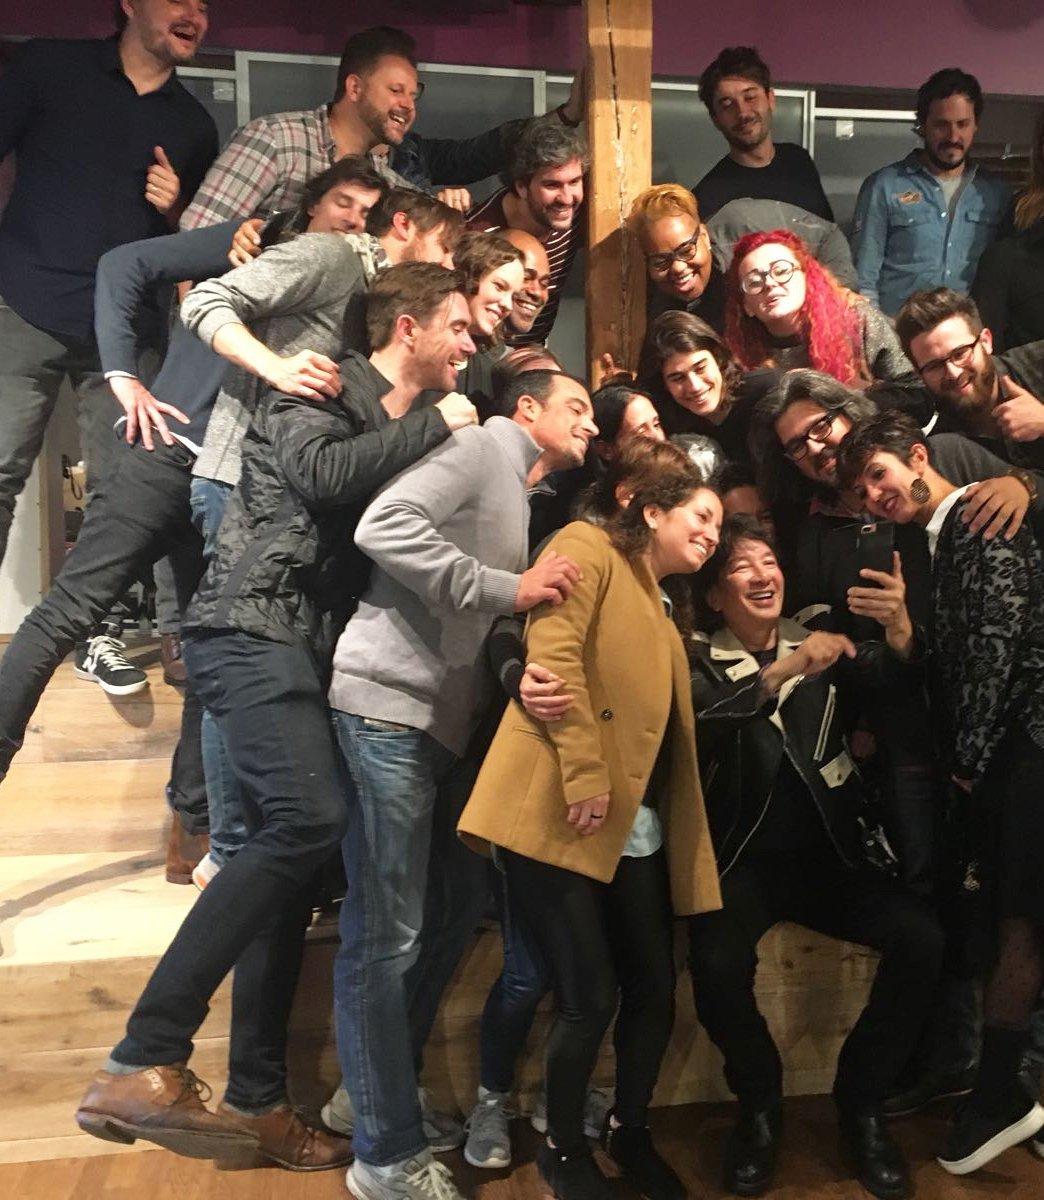 RT @ThamKhaiMeng: What turns MBA students on? A selfie of course! @BerlinSchool #berlinschool #futurecreativeleaders https://t.co/2HaAMuj0wY